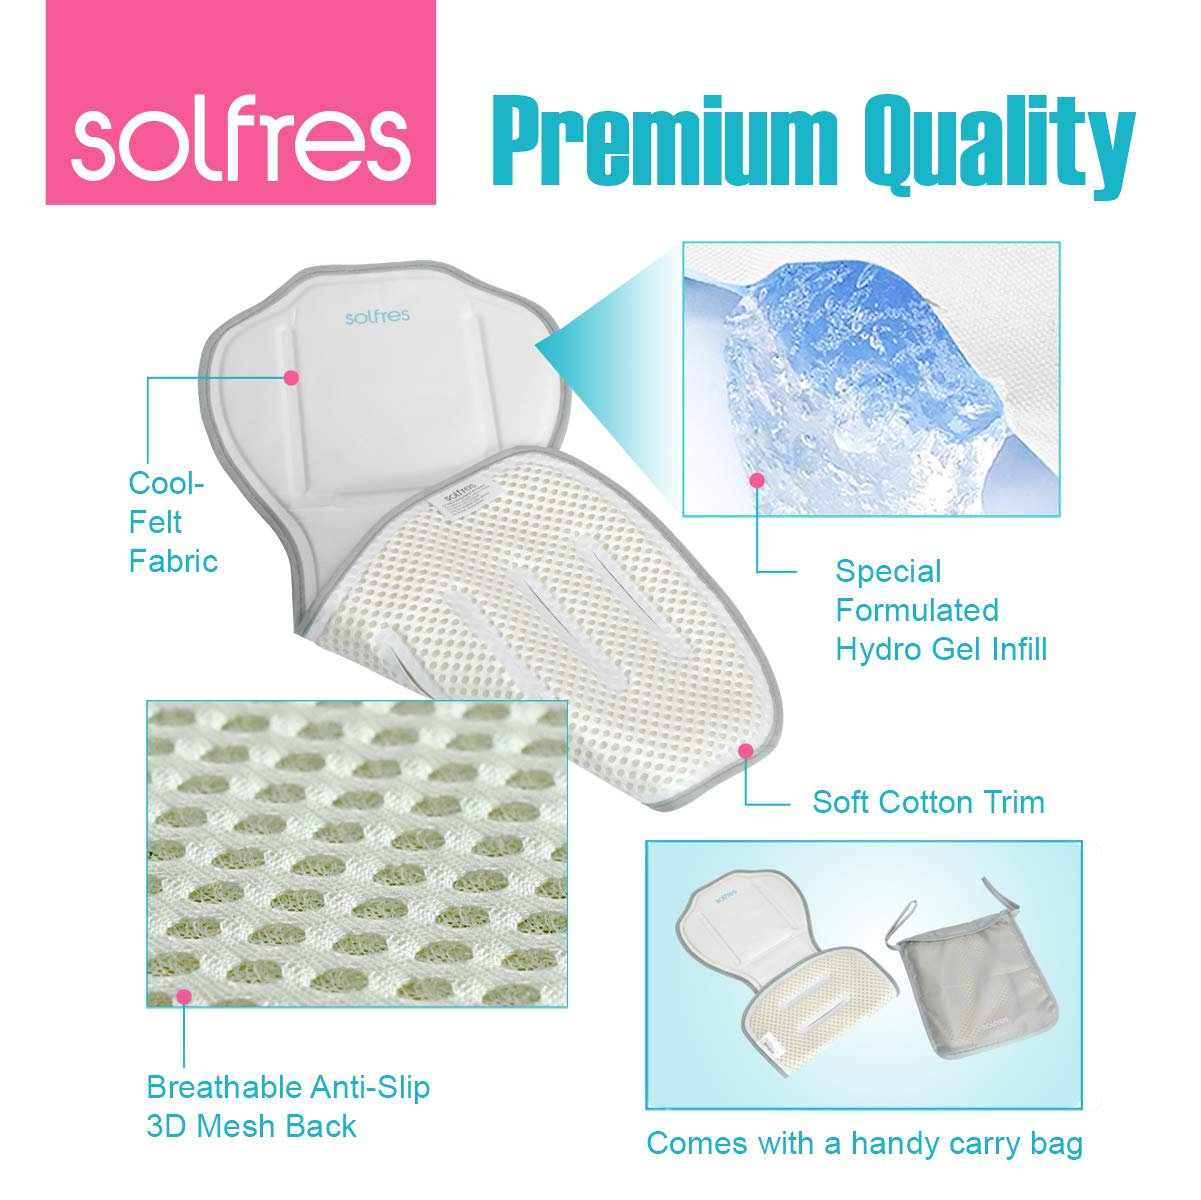 Amazon.com: Solfres Hydro Gel - Colchoneta para asiento de ...